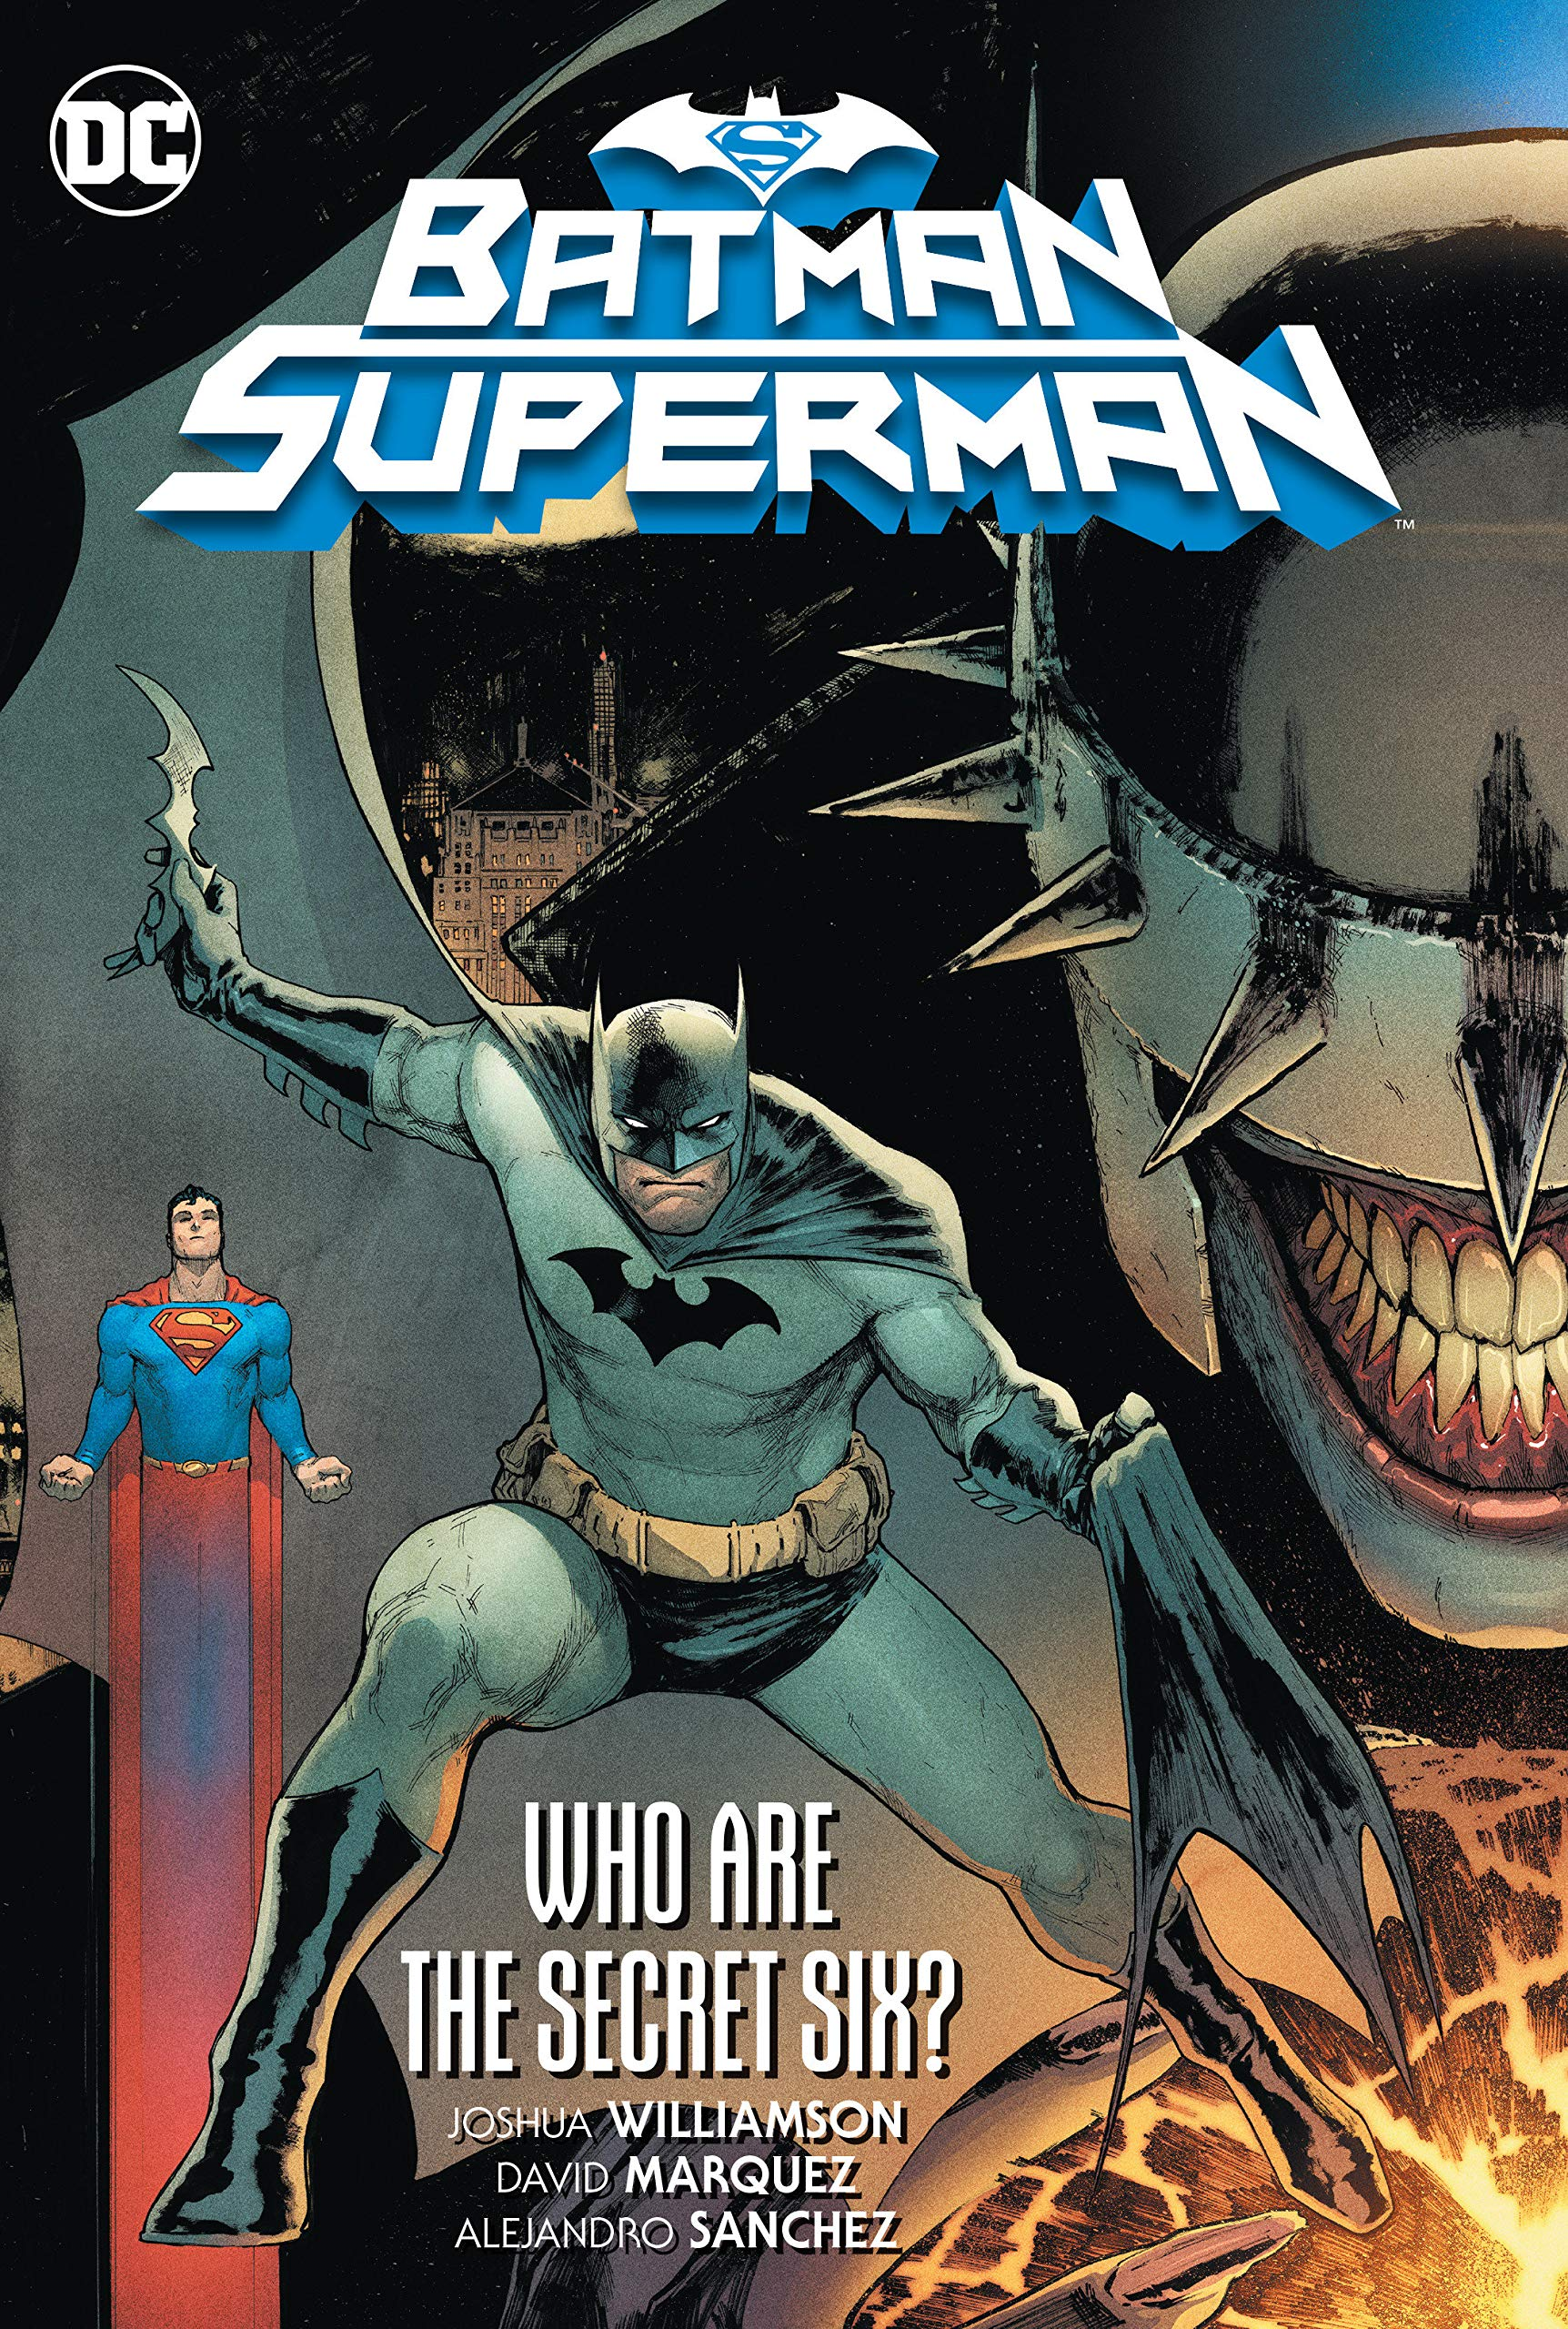 Superman 26 27 28 29 30 31 32 Complete Rebirth Comic Lot Run Set EXCELSIOR BIN